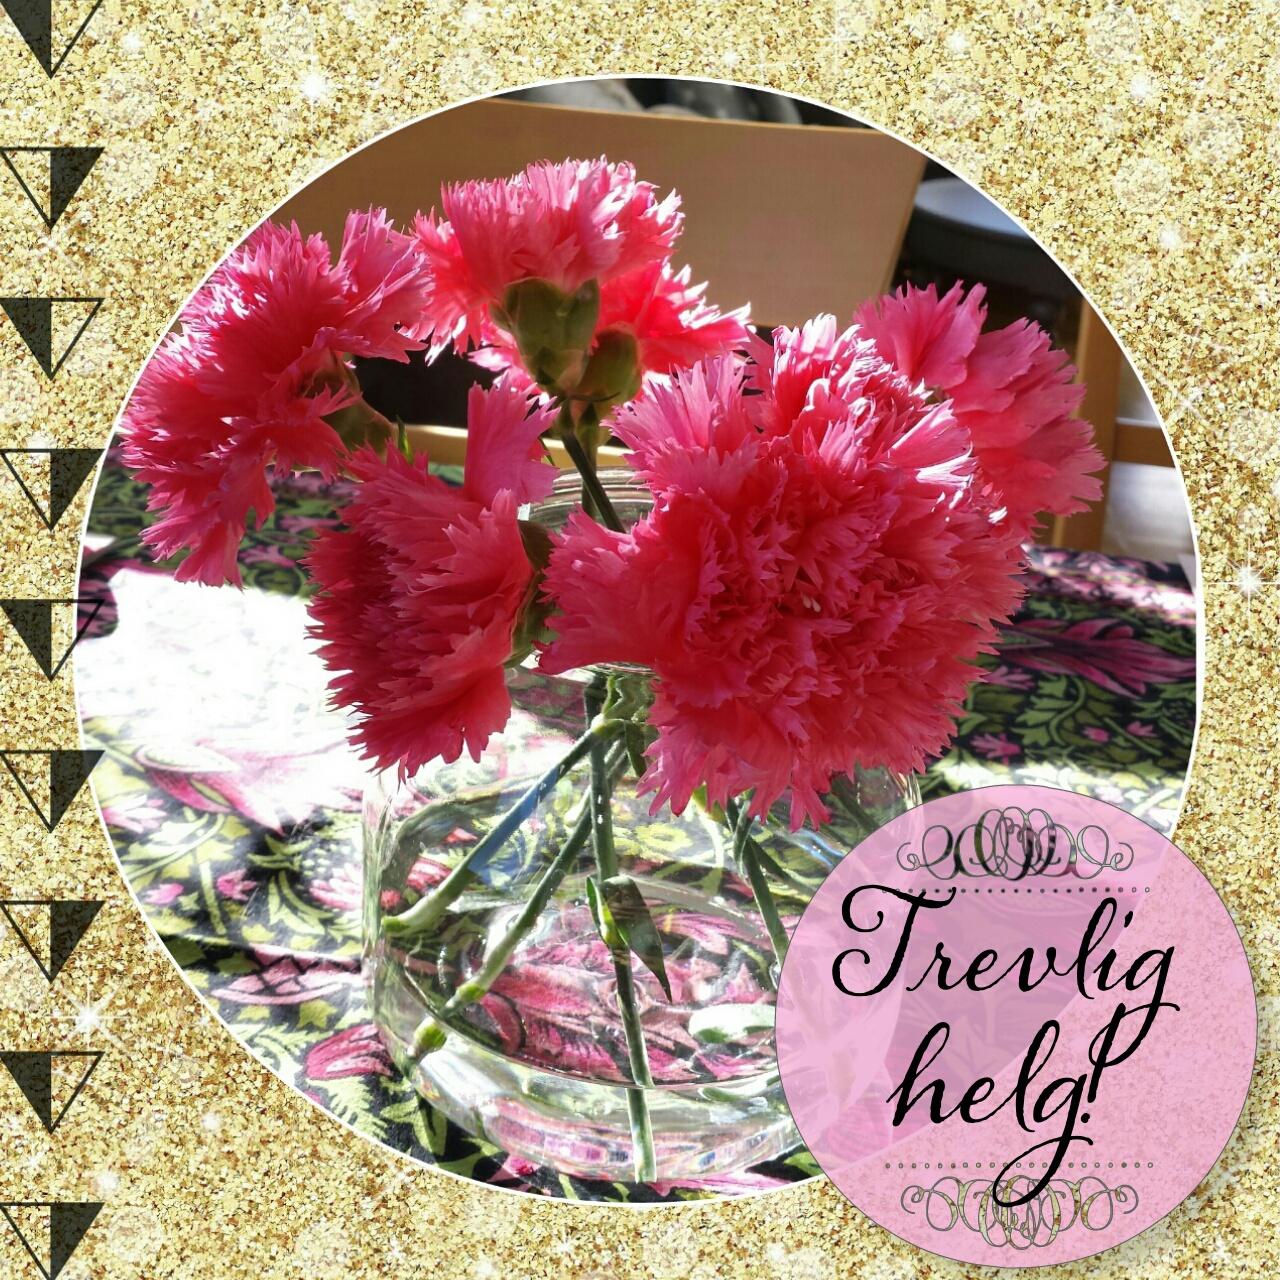 trevlig helg, nejlikor, rosa, pink, flowers, gold